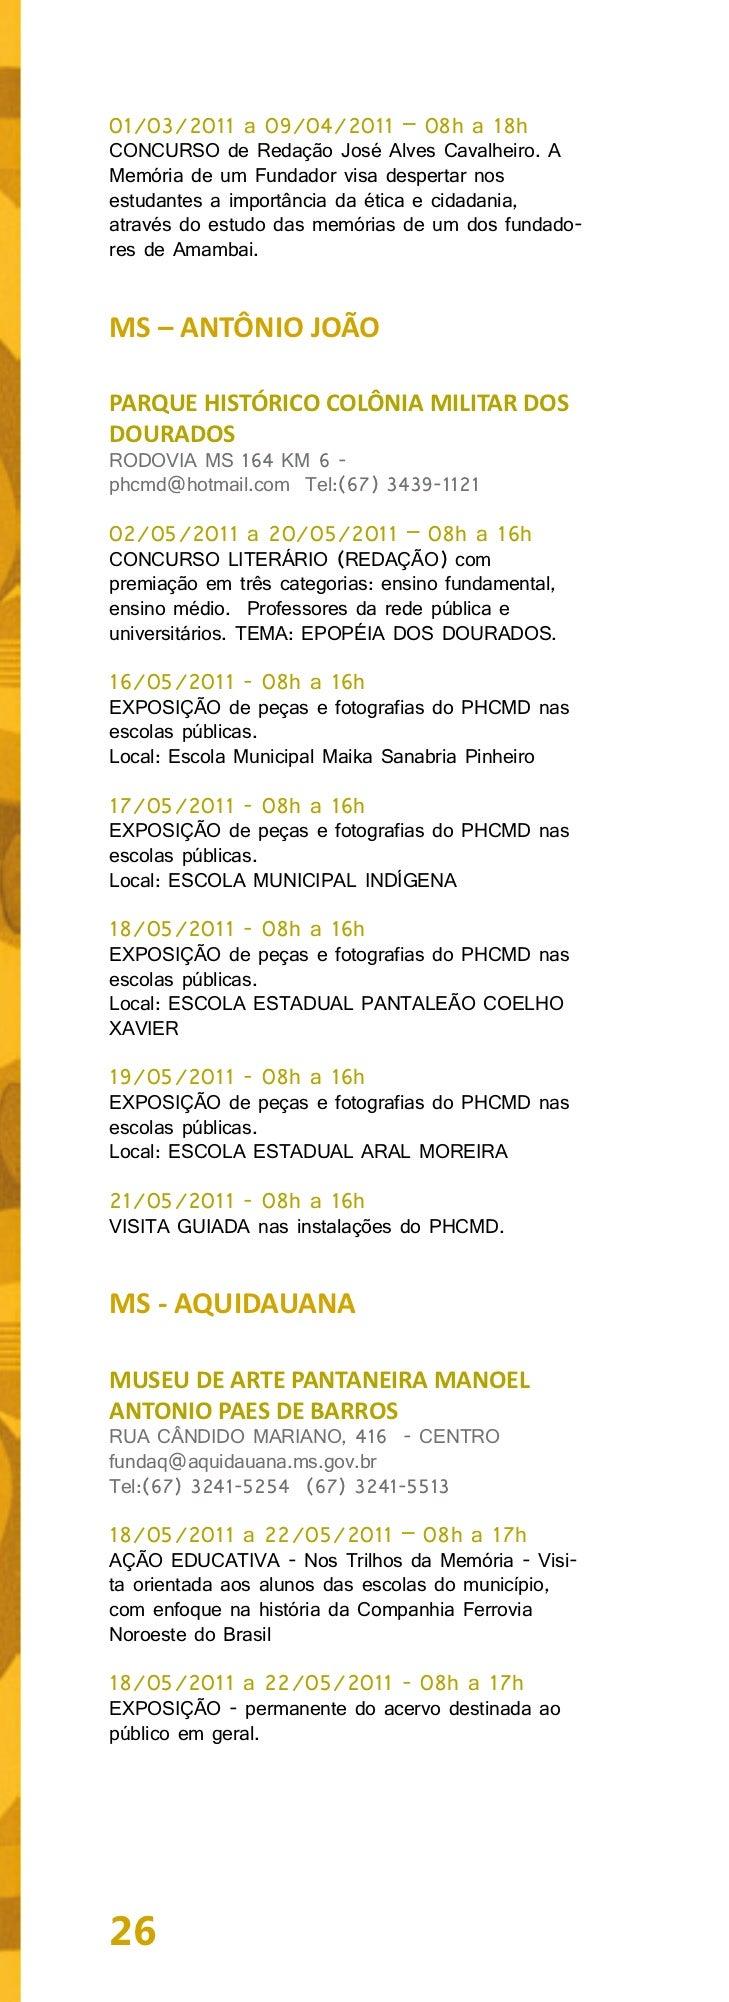 MS - BELA VISTAMUSEU HISTÓRICO DE BELA VISTARUA CORONEL DIAS, 498 - CENTRO - CENTROmuseuhistoricod3@gmail.comTel:(67) 3932...